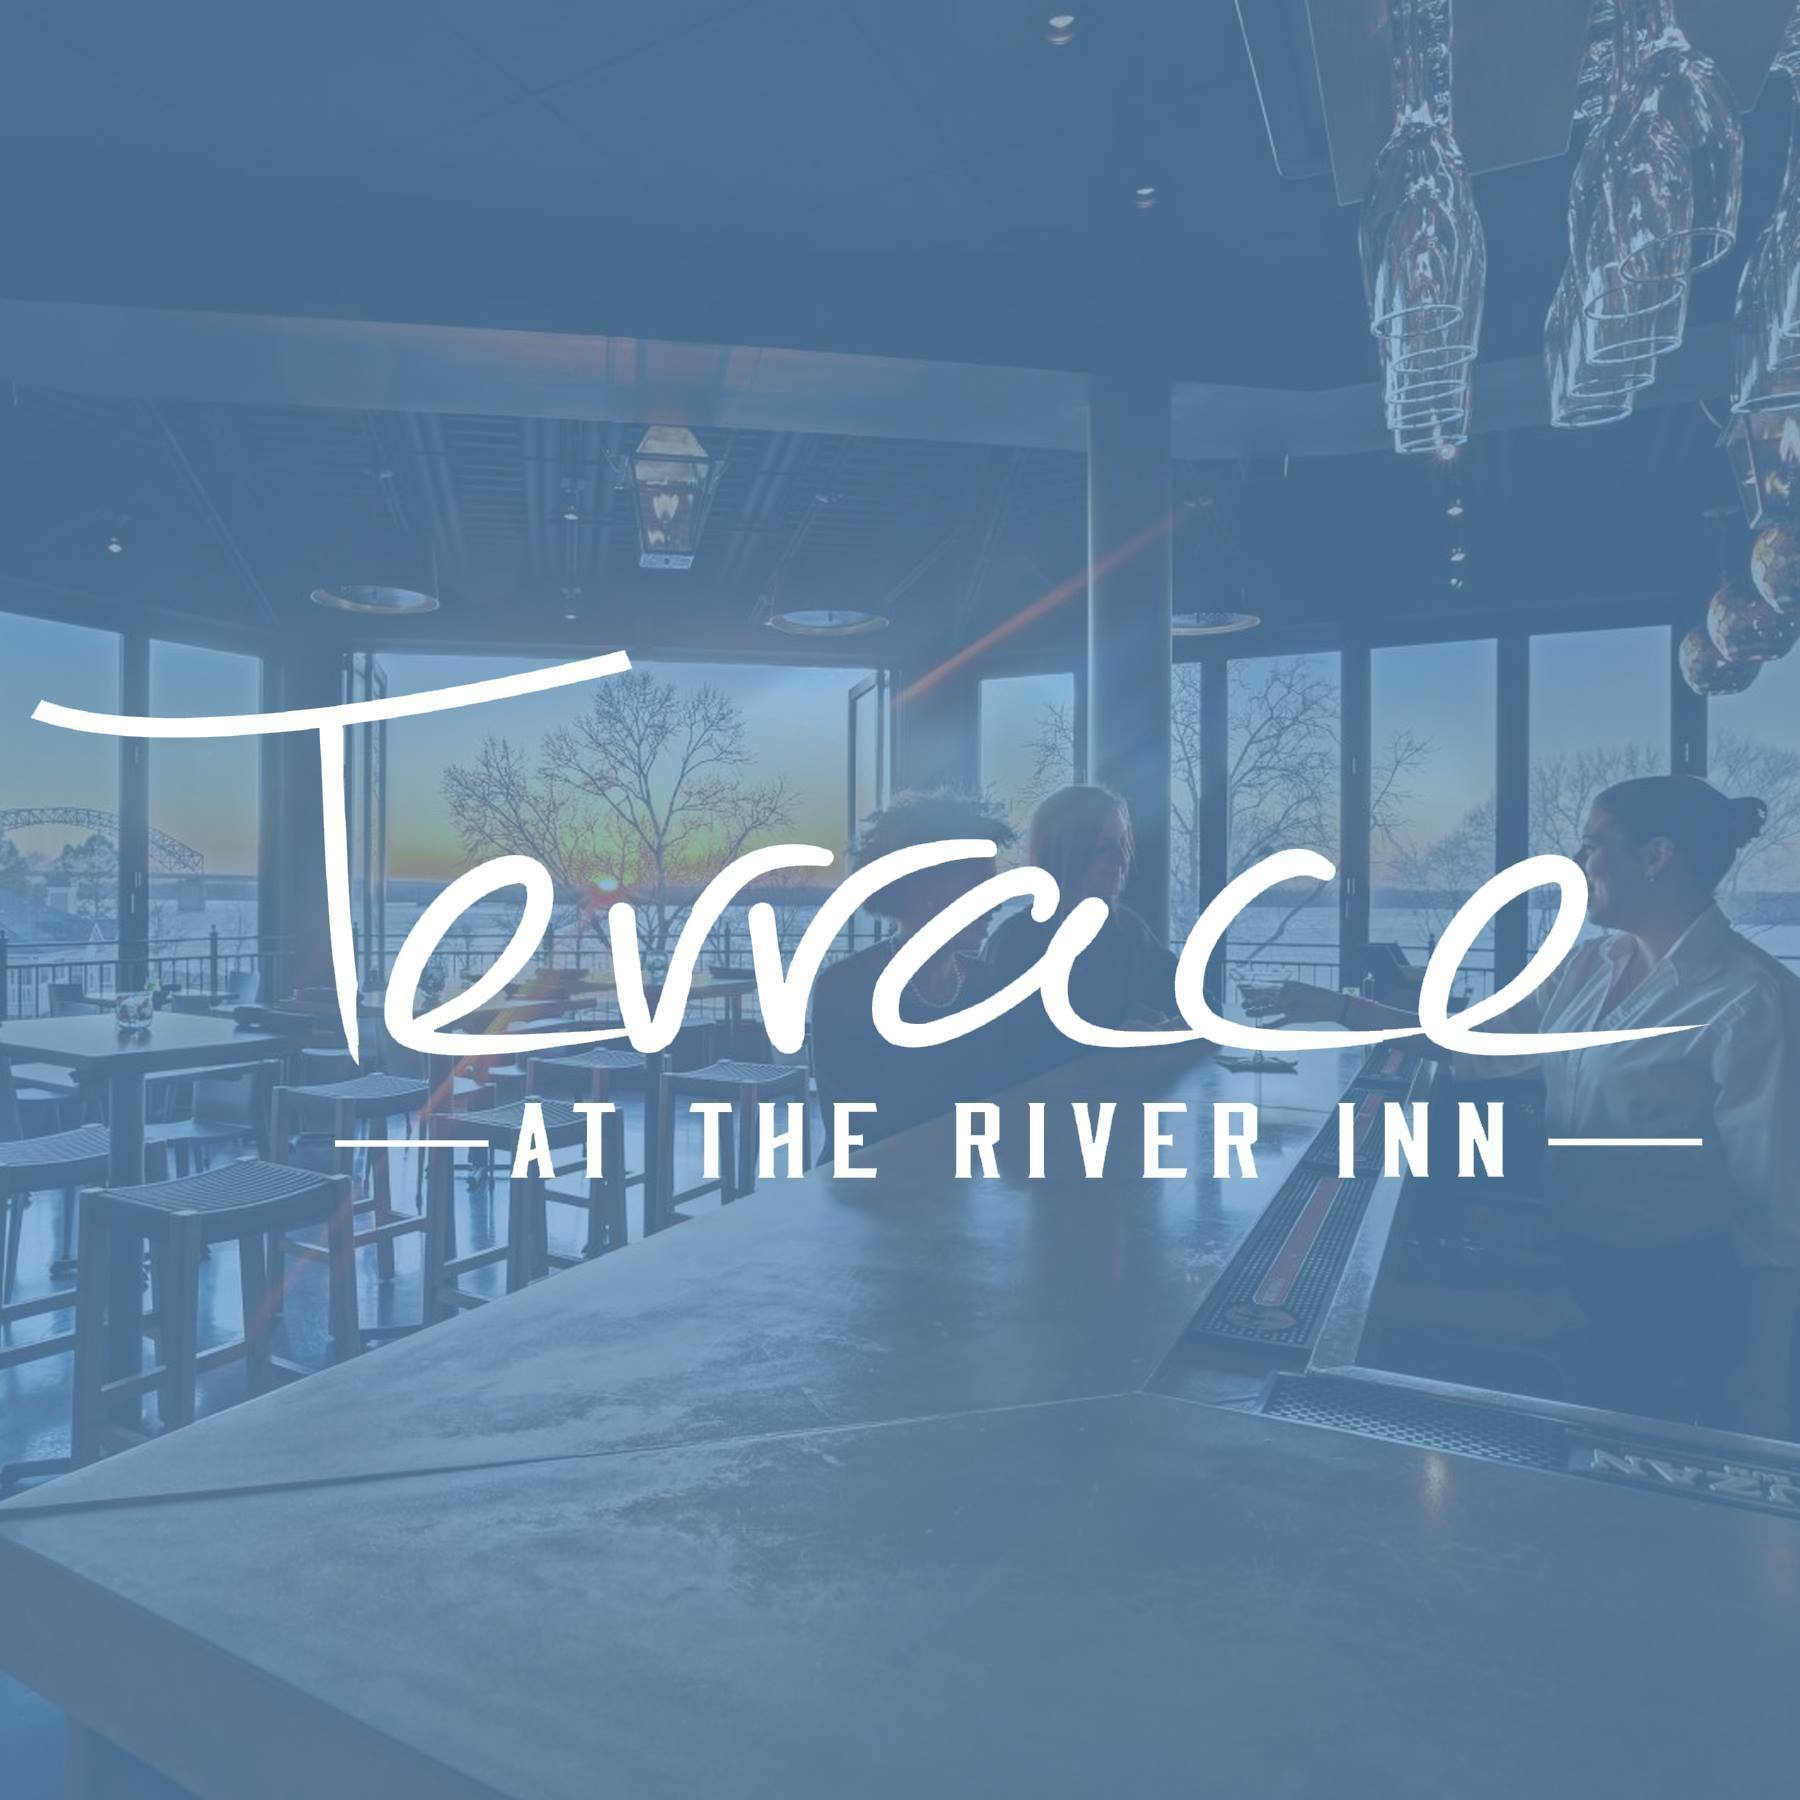 Terrace at the River Inn